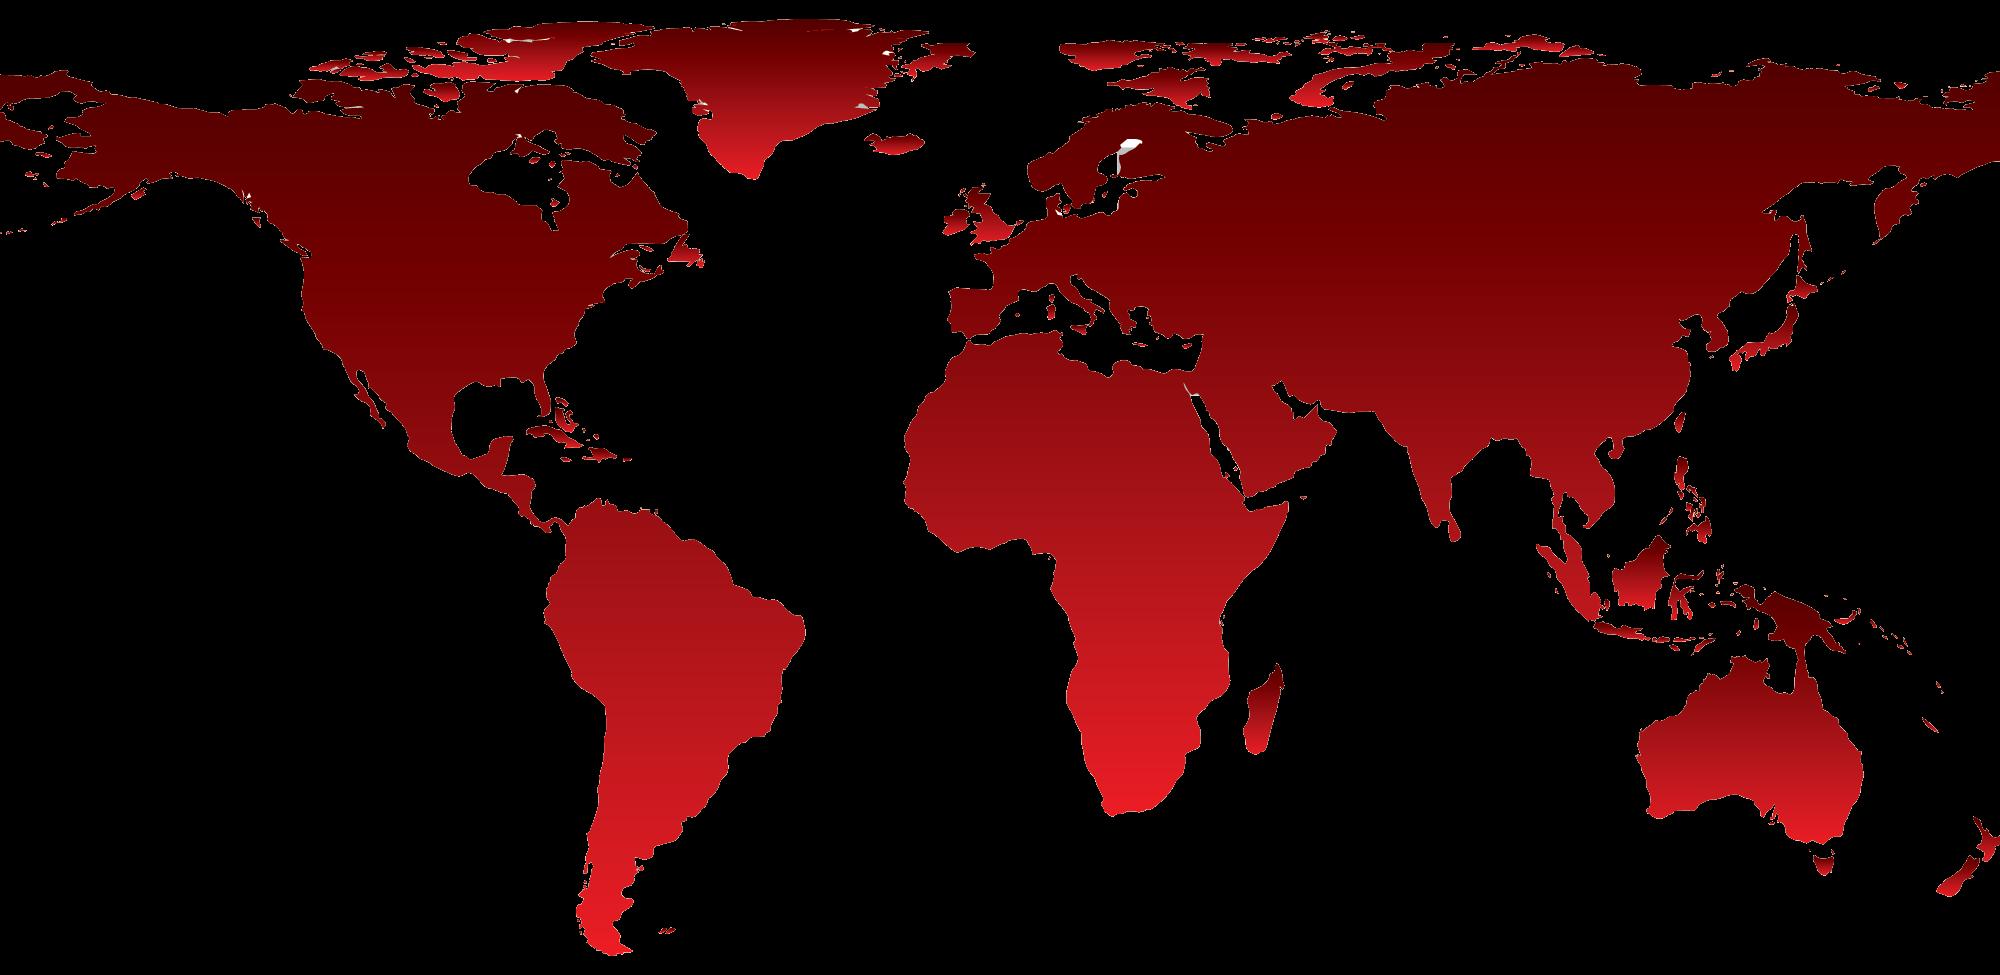 worldmap-transparent-2000